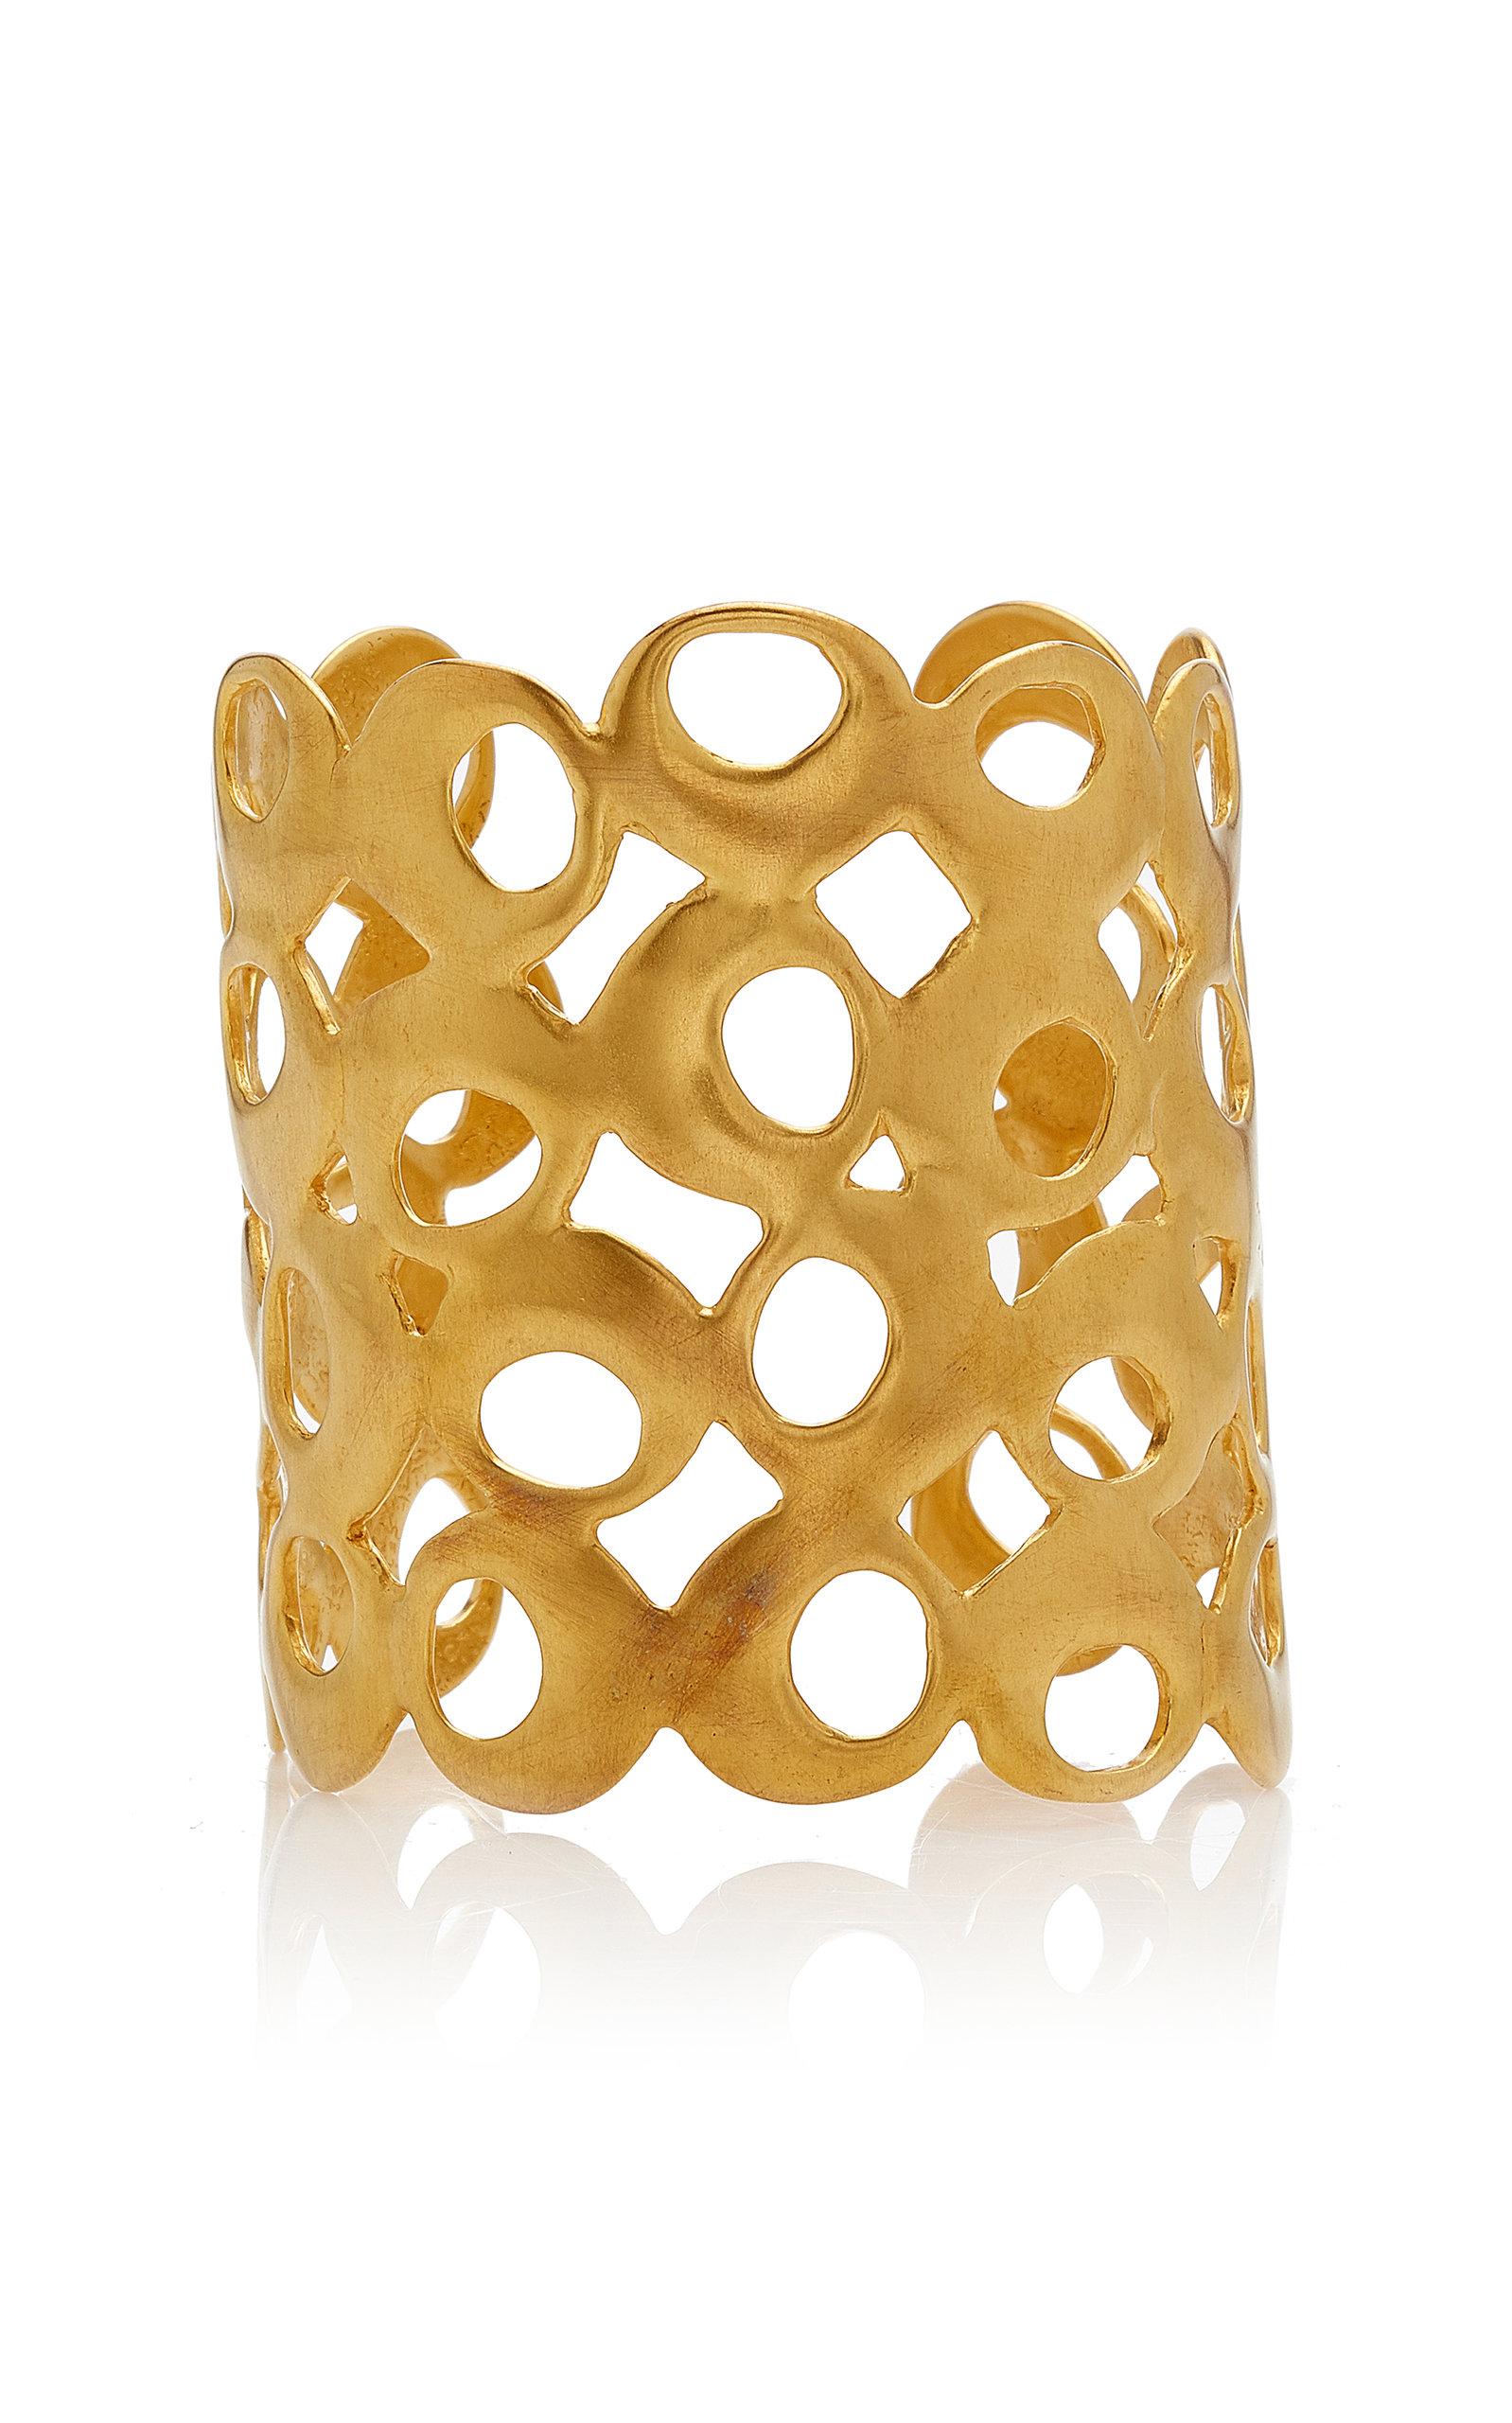 Women's Nariguera 24K Gold-Plated Cuff